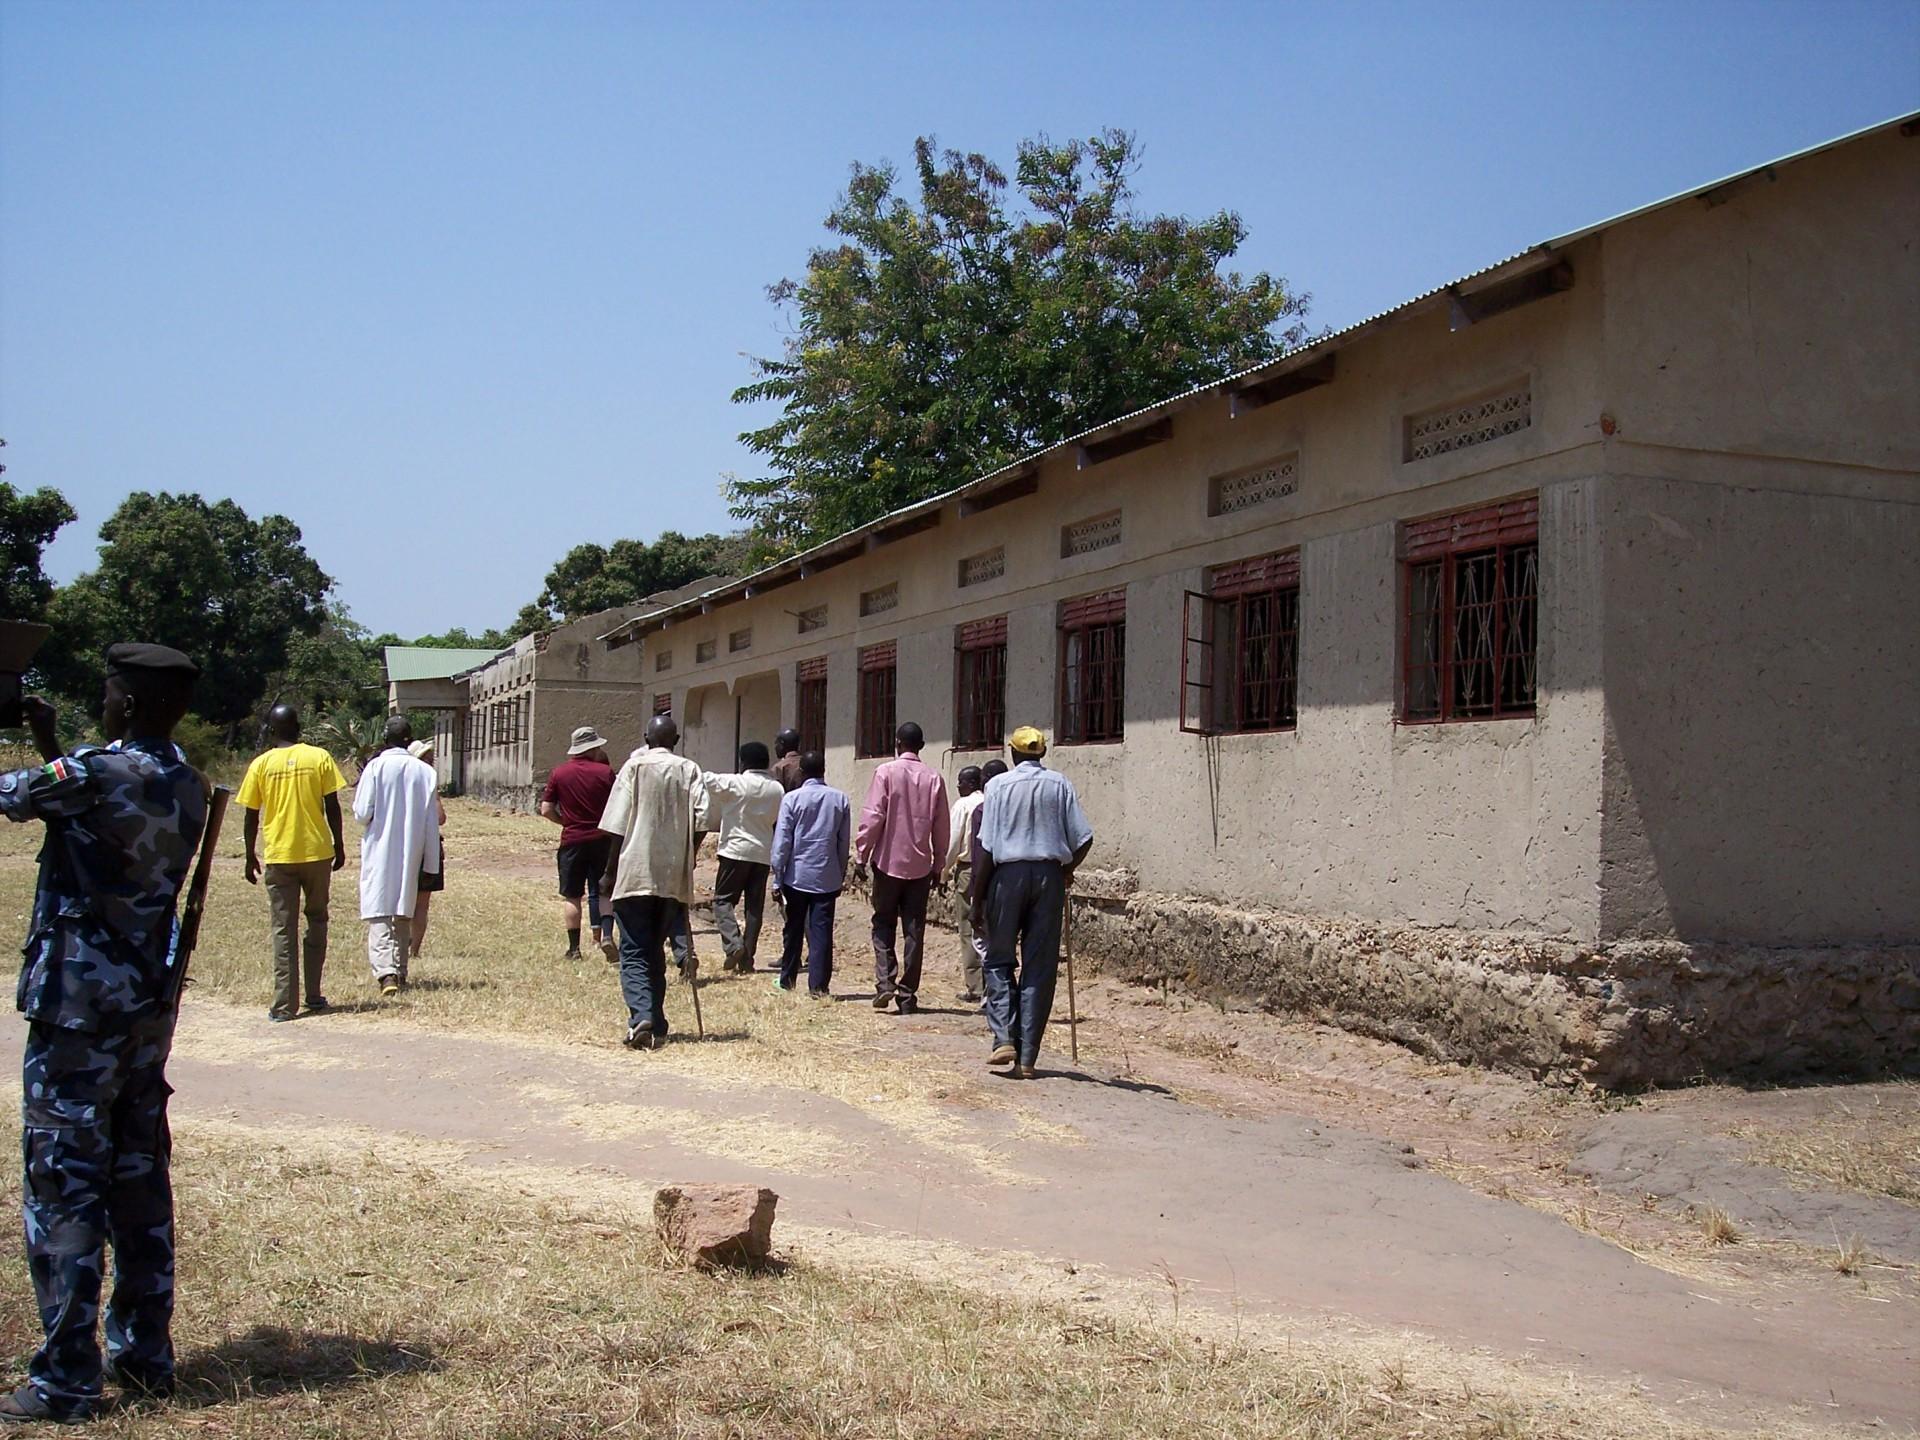 Hospital Ward Building